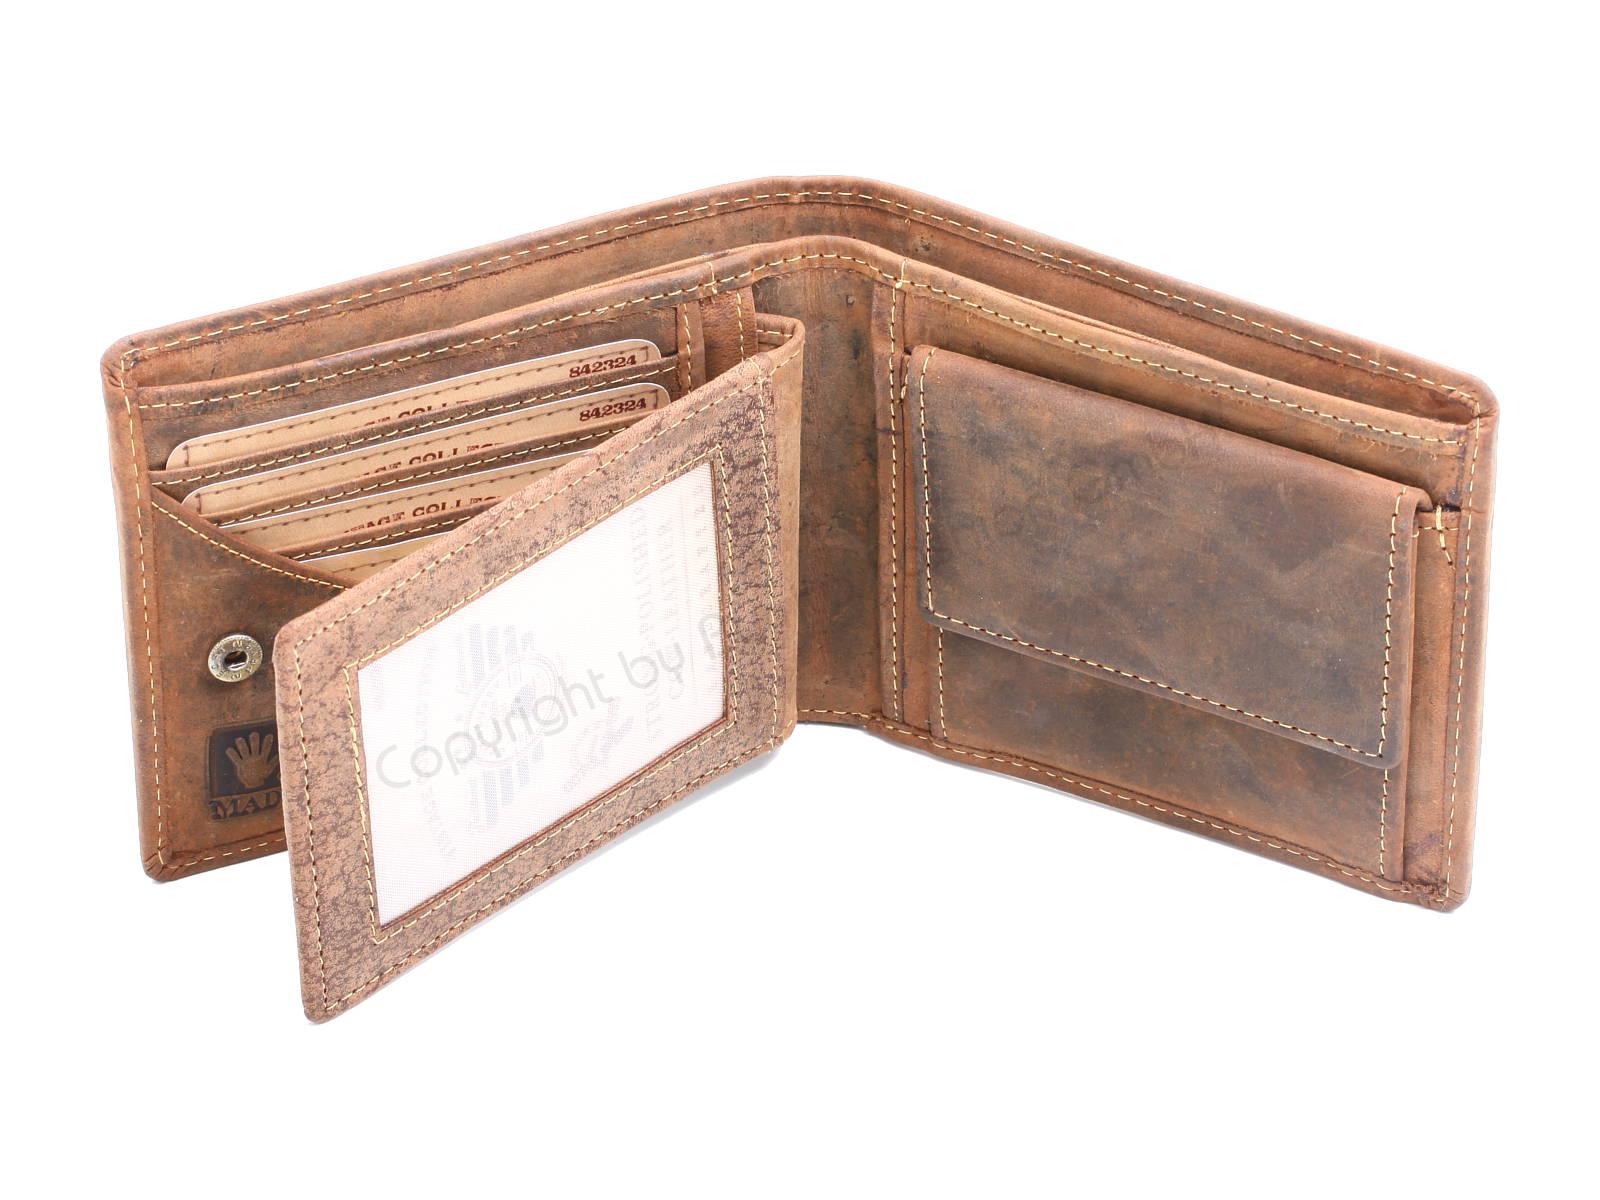 77a611e737cef Greenburry Vintage Ledergeldbörse 1702 - Portemonnaie Paradies